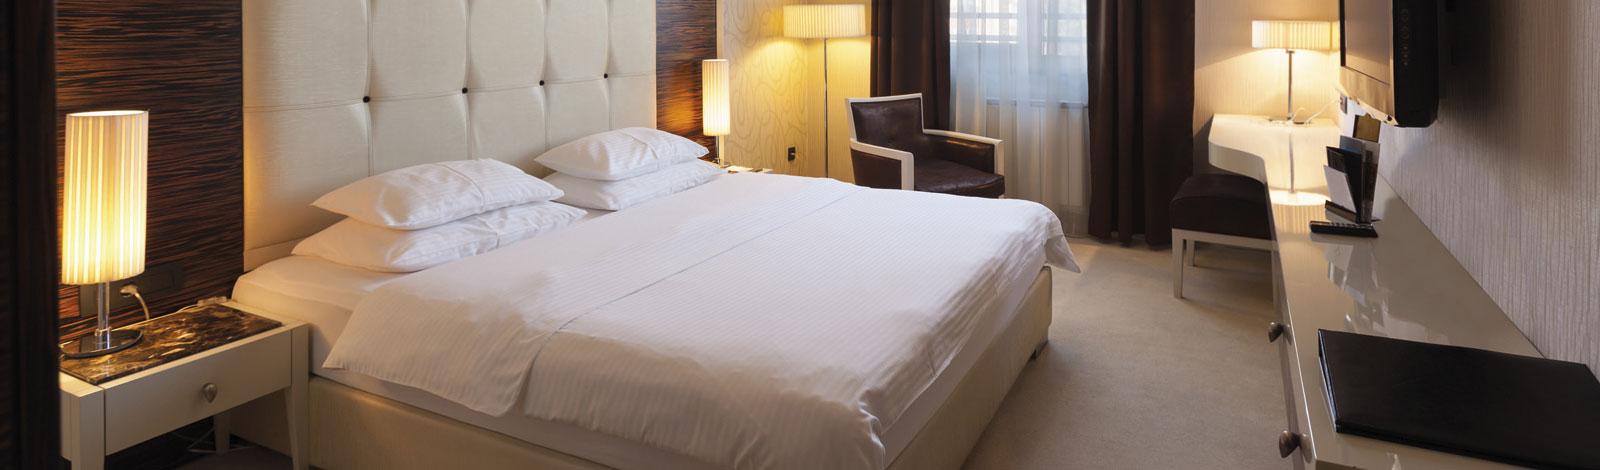 Éradication des nuisibles hotel